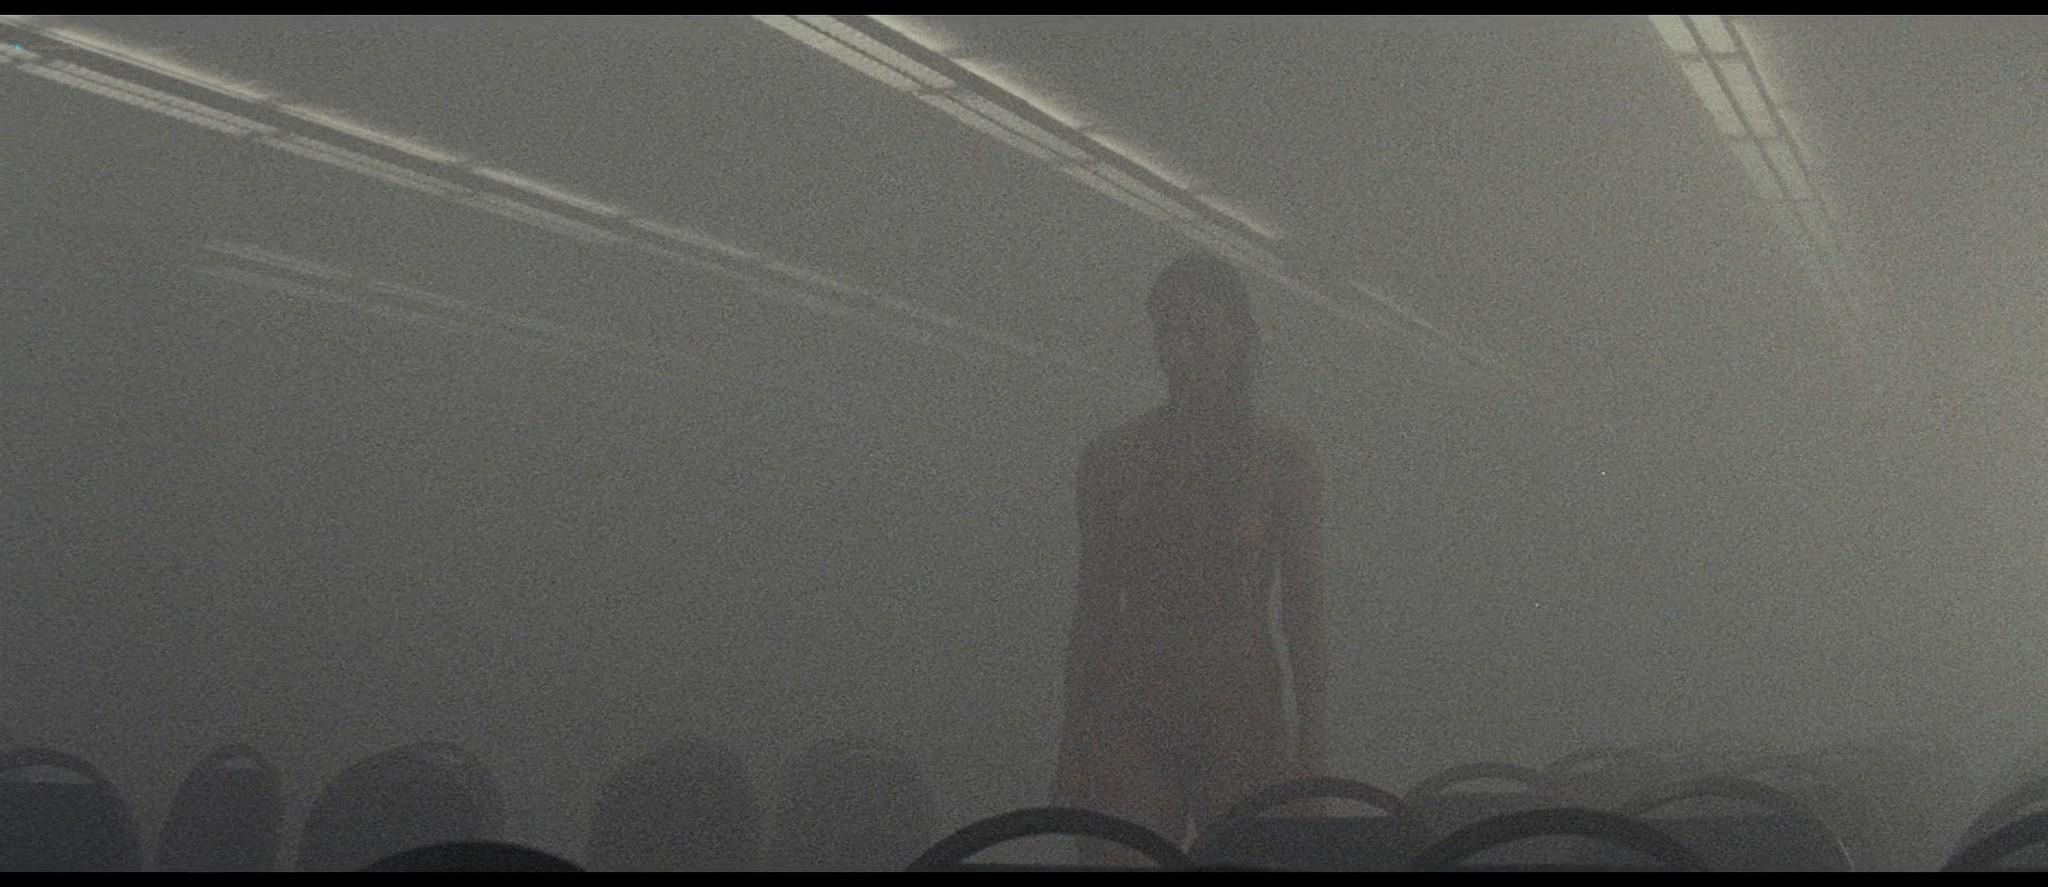 Lilli Lorenz nude full frontal - Luz (2018) HD 1080p BluRay (5)